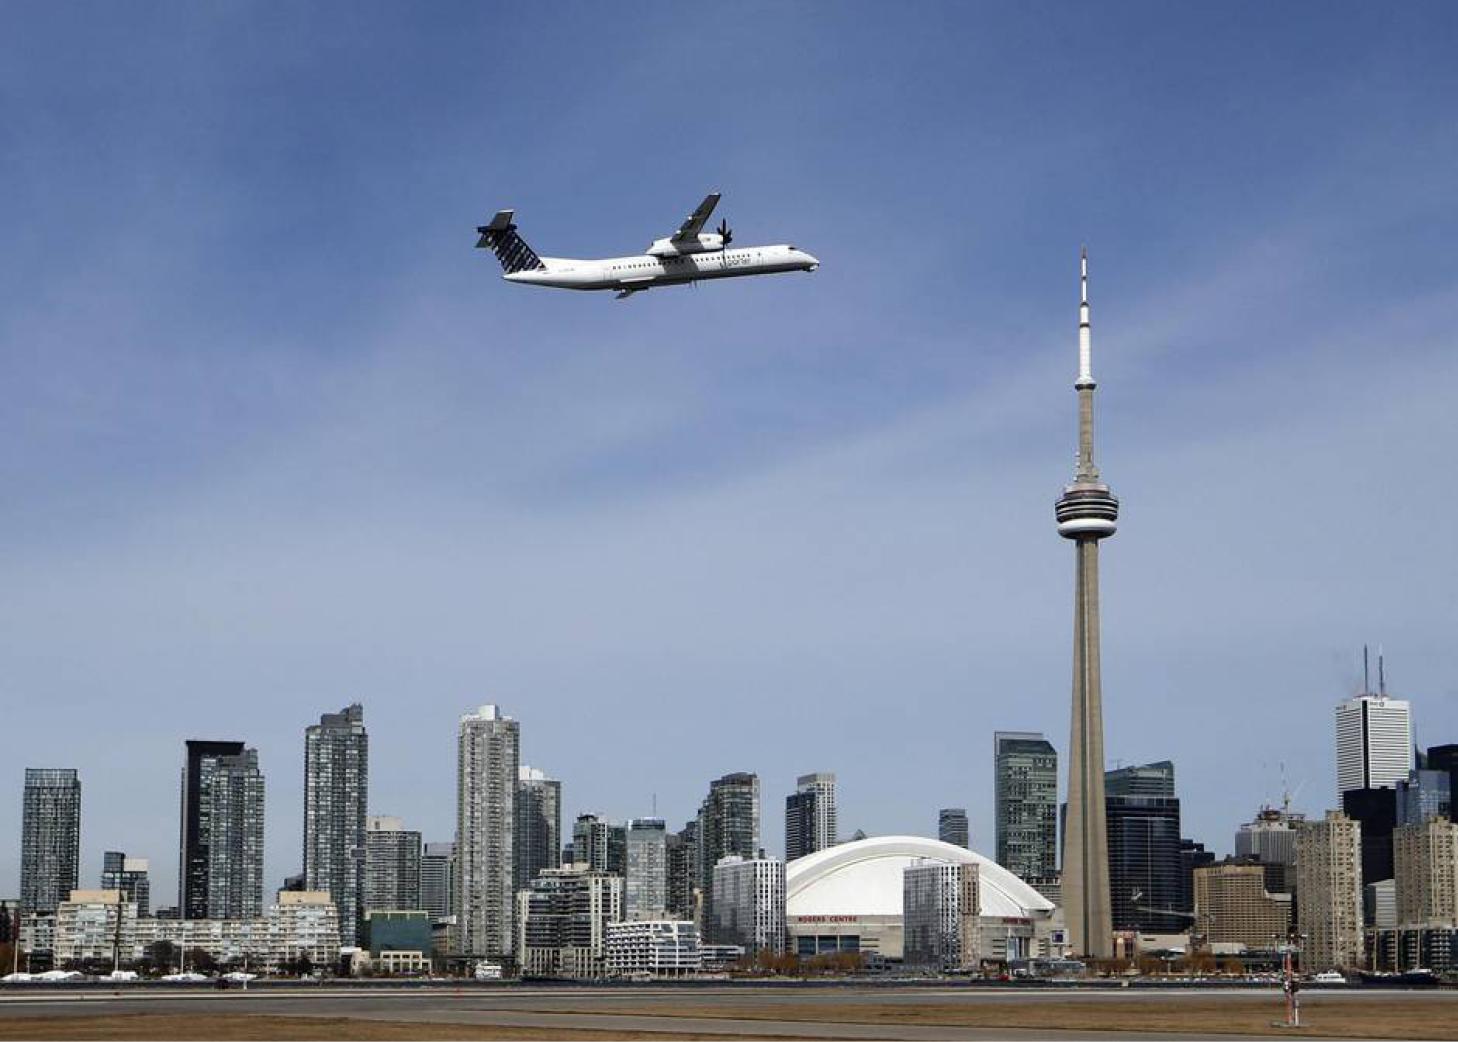 Americas-Canada-Billy-Bishop-Toronto-City-Airport-01